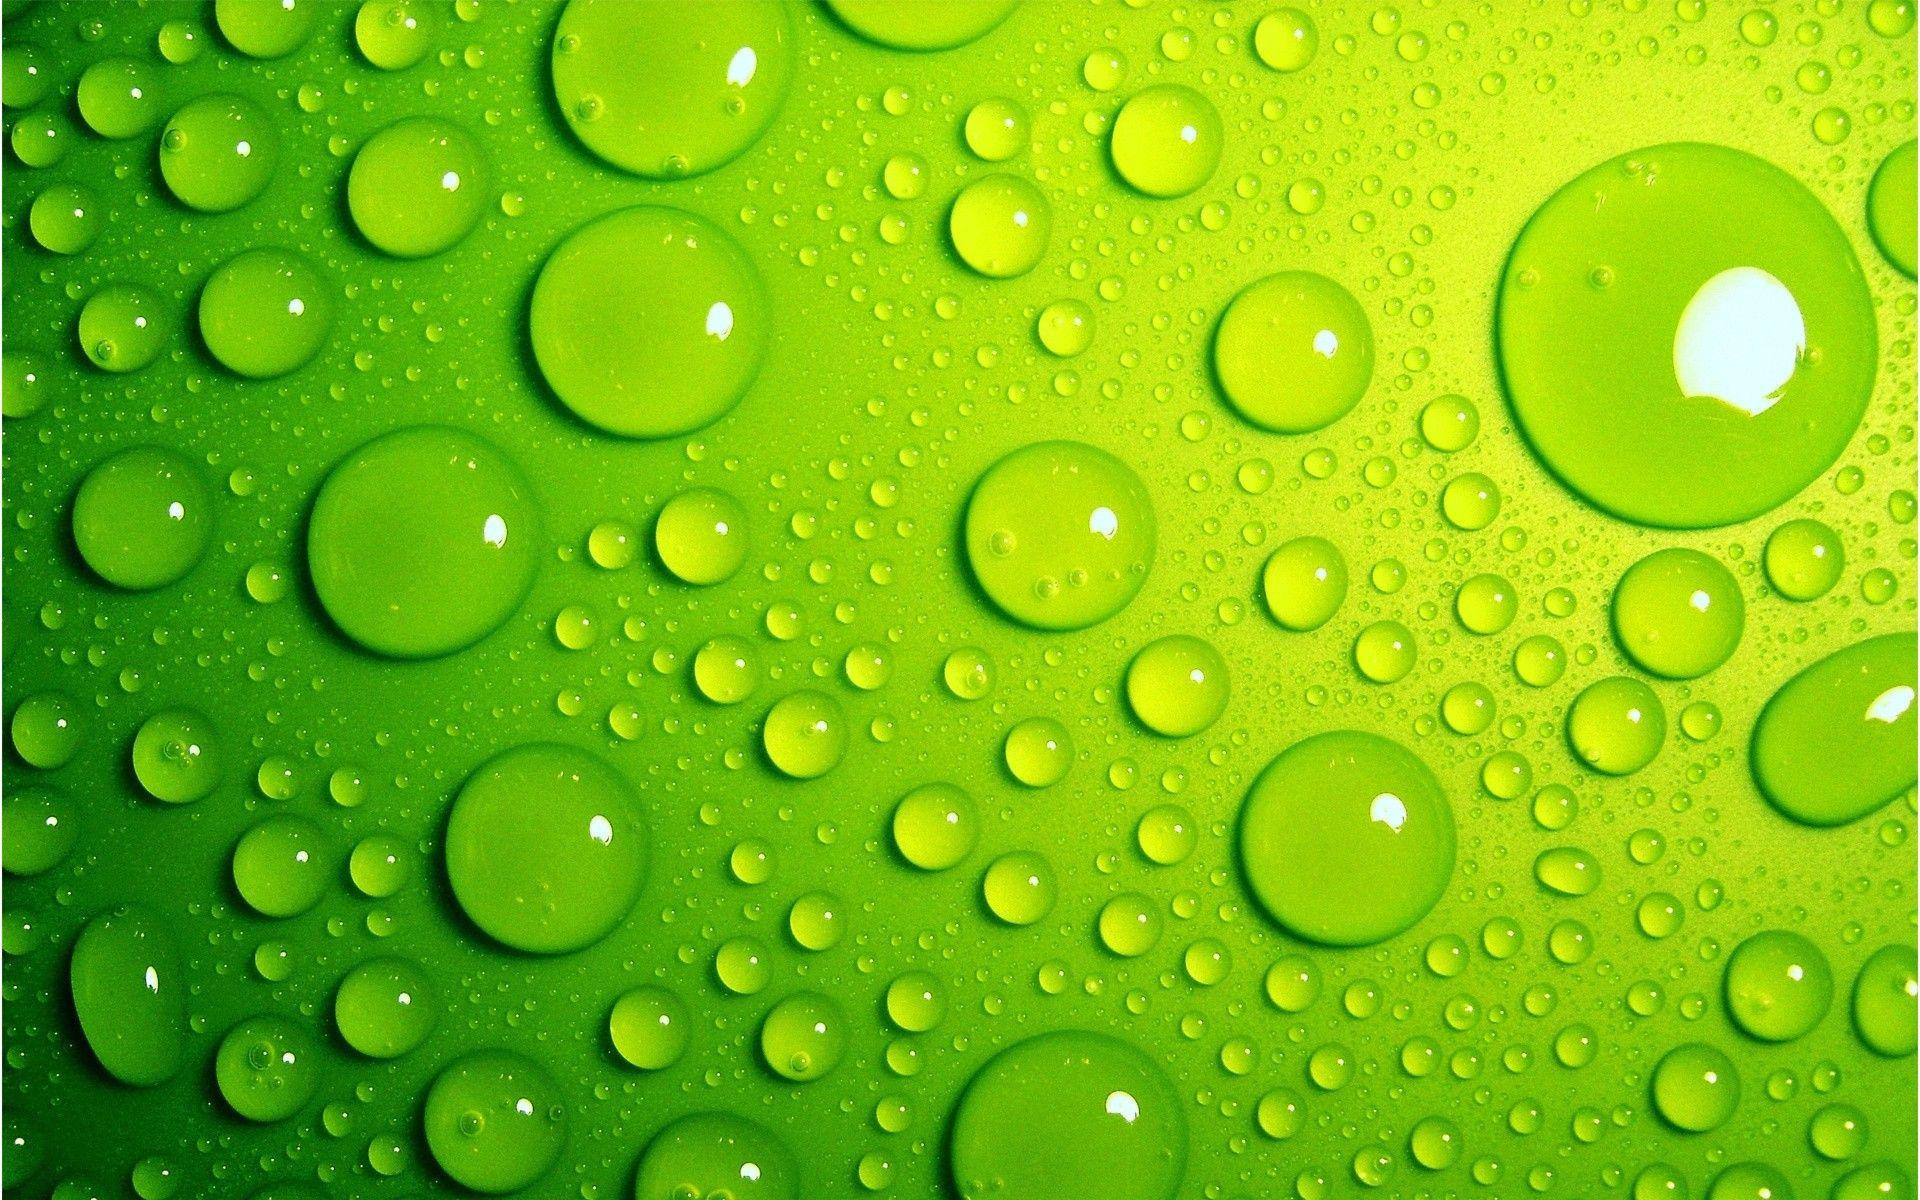 Pin On Texturas Hd wallpaper lime slice bubbles macro